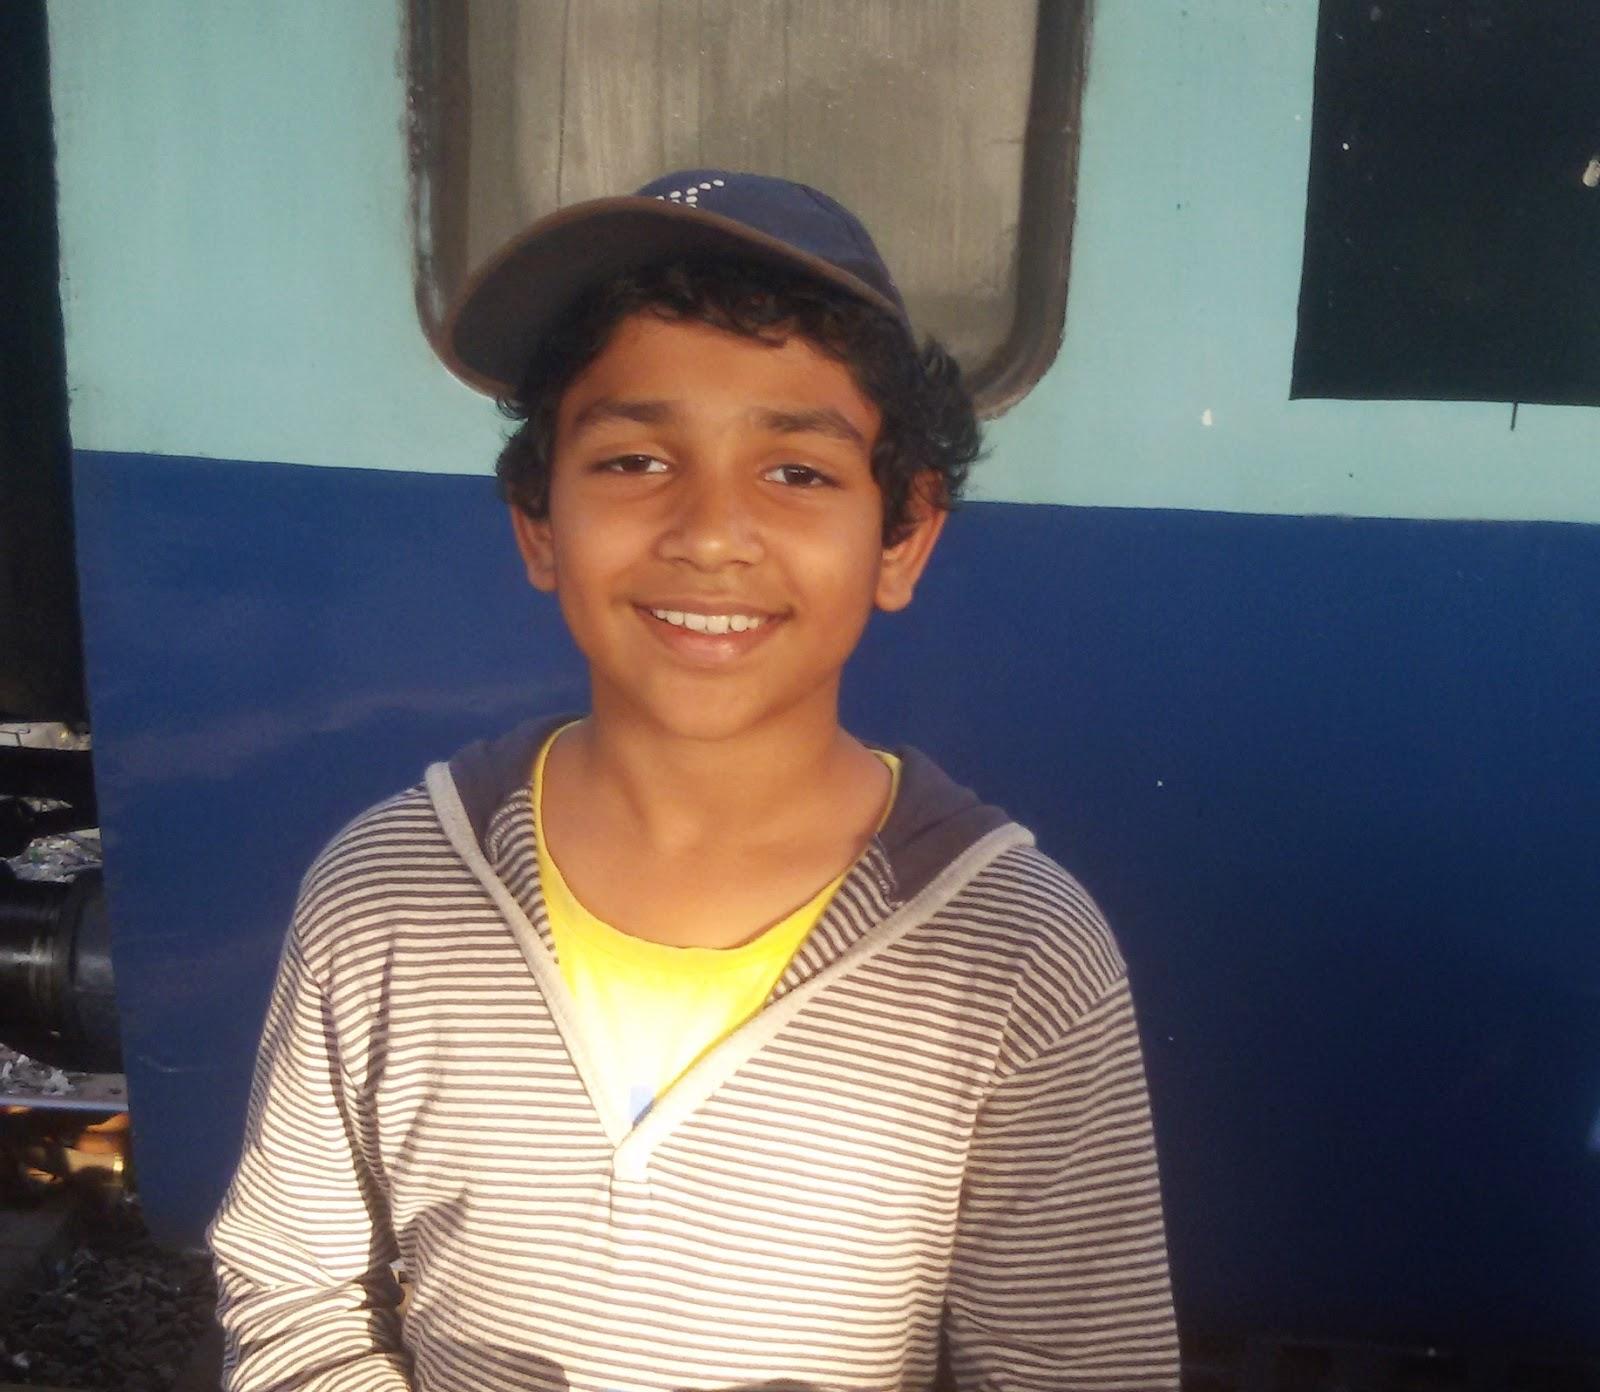 Kids Who Read: Abhimanyu Mhatre, Class 6, MET Rishikul Vidyalaya, Mumbai